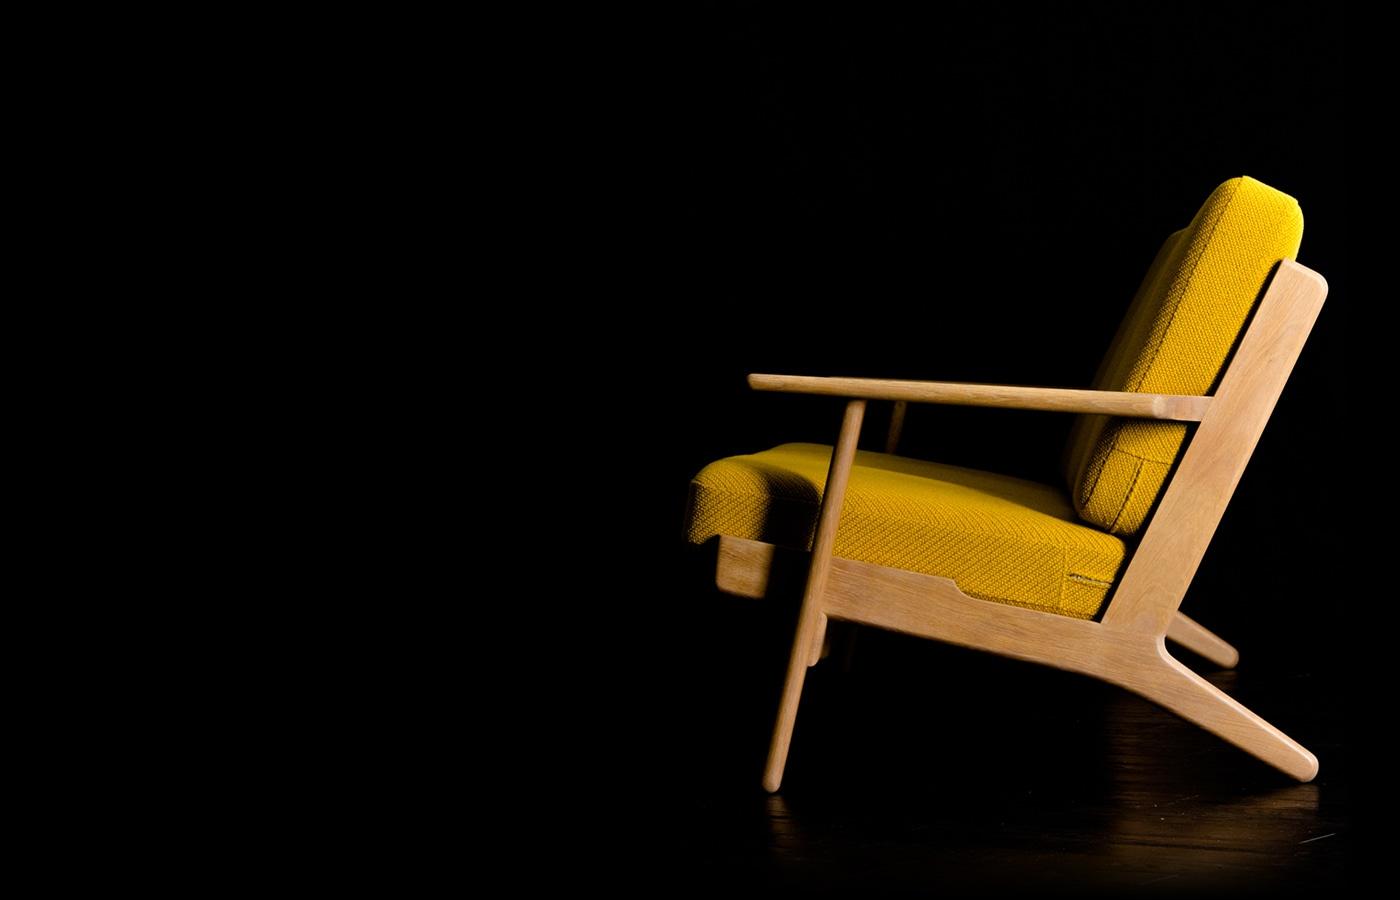 GE290 3 seaters sofa